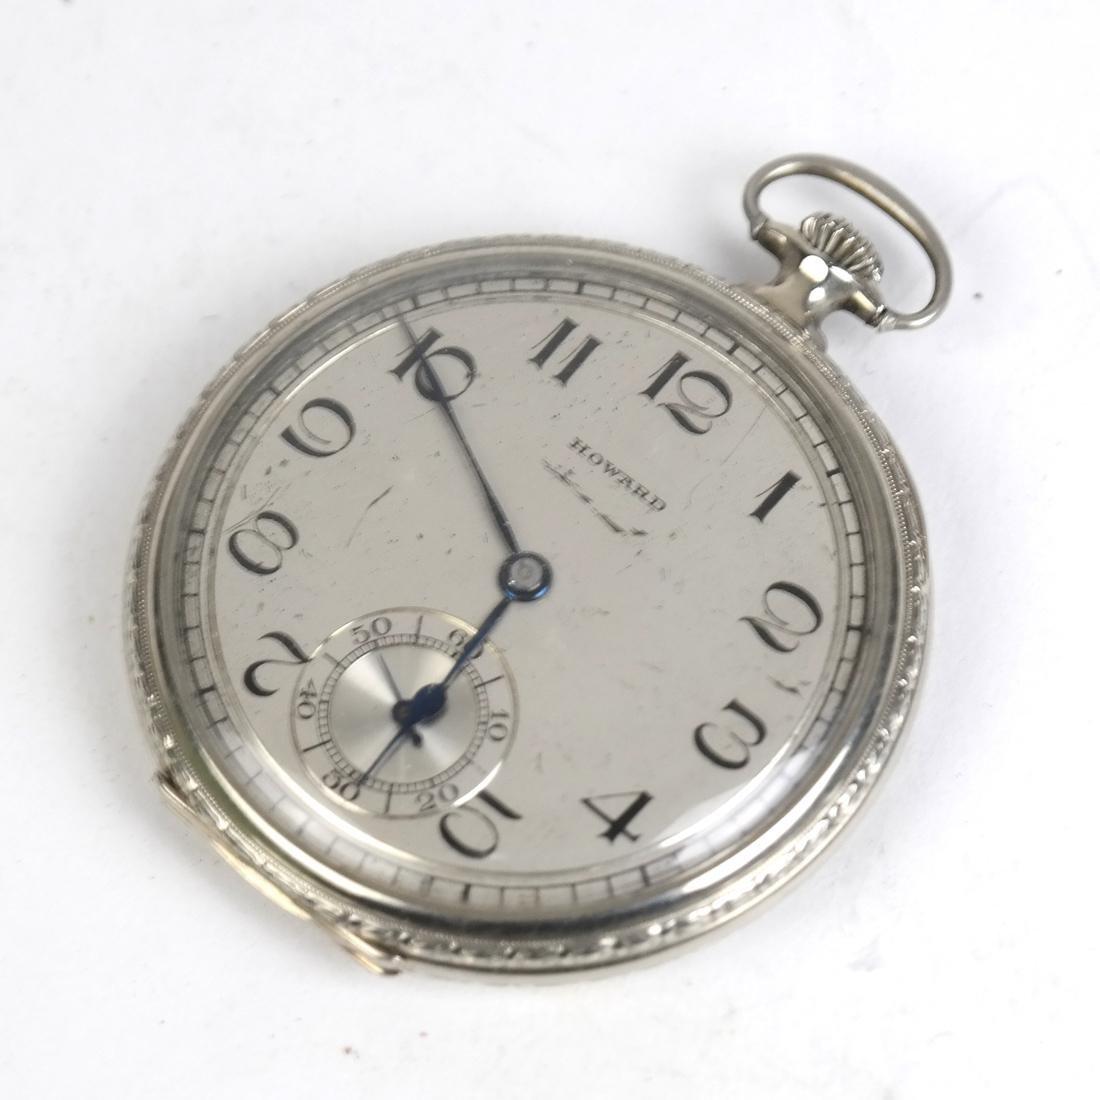 E. Howard & Co, 14k Pocket Watch